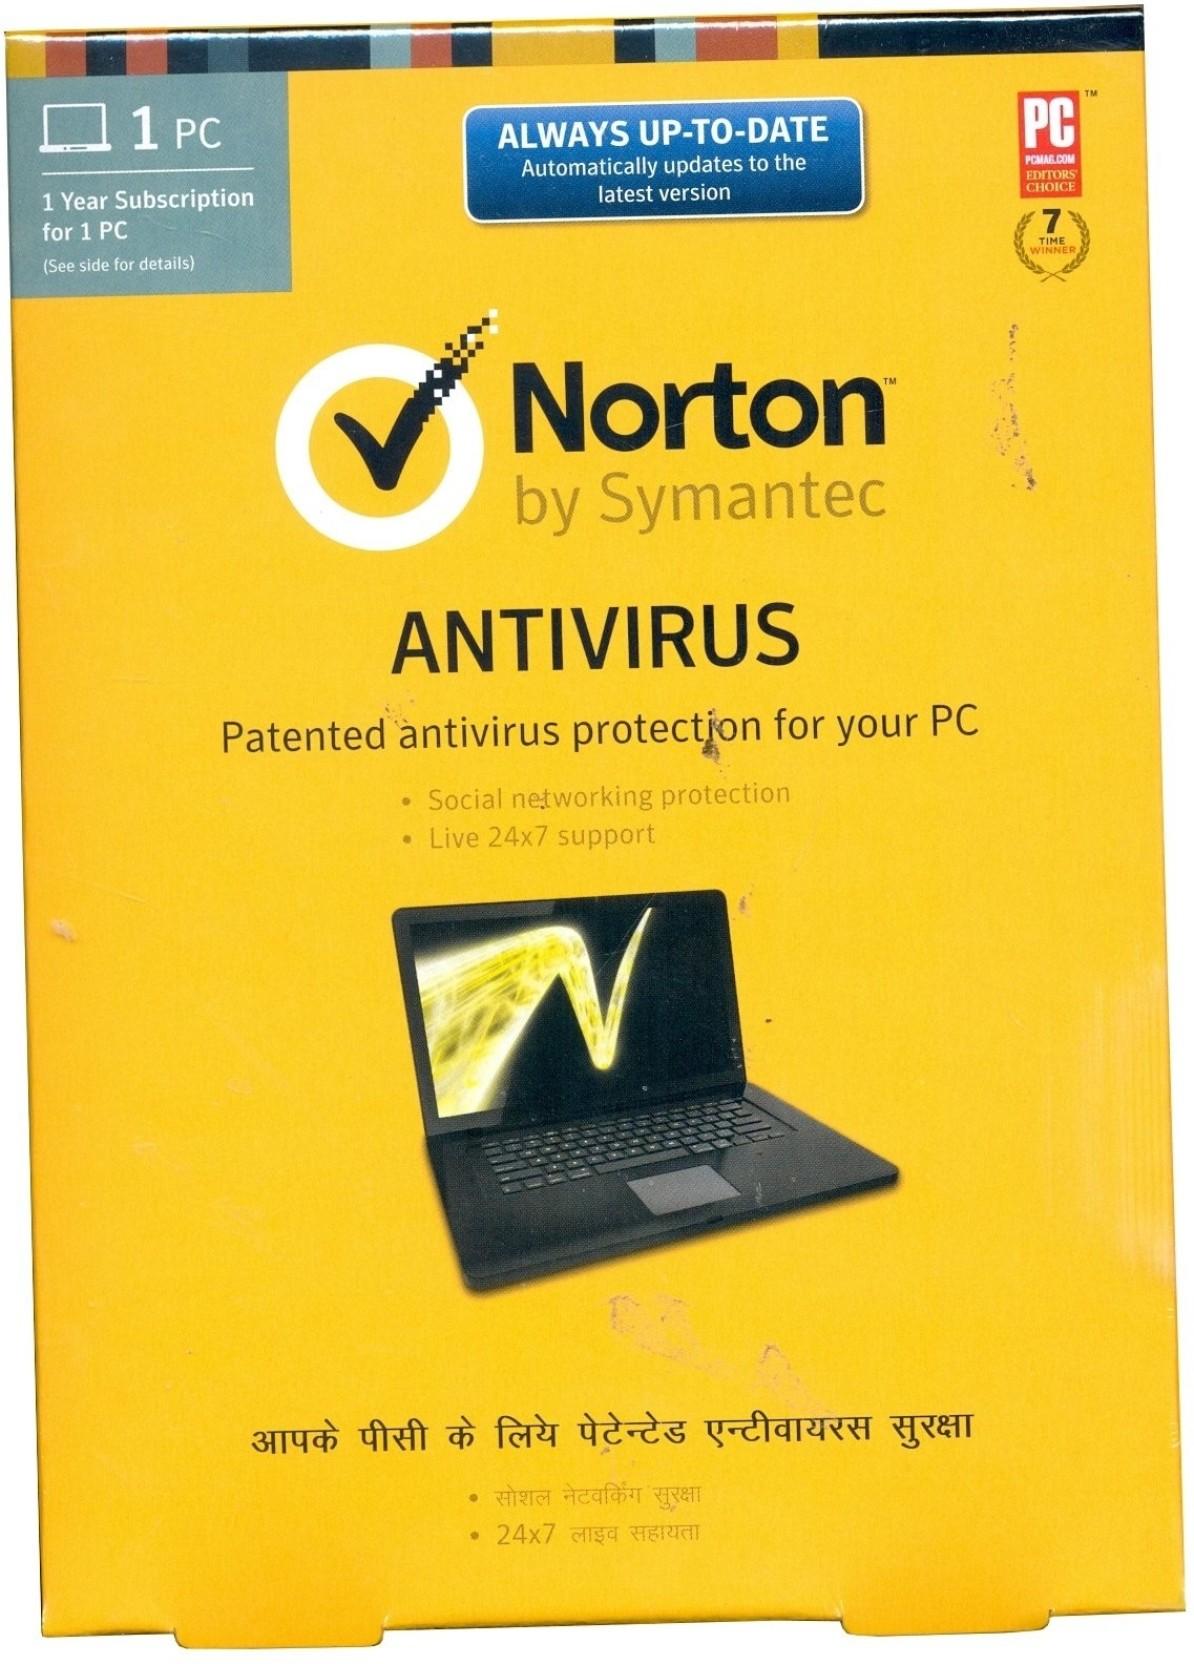 norton antivirus 1 pc 1 year buy norton antivirus 1 pc 1. Black Bedroom Furniture Sets. Home Design Ideas